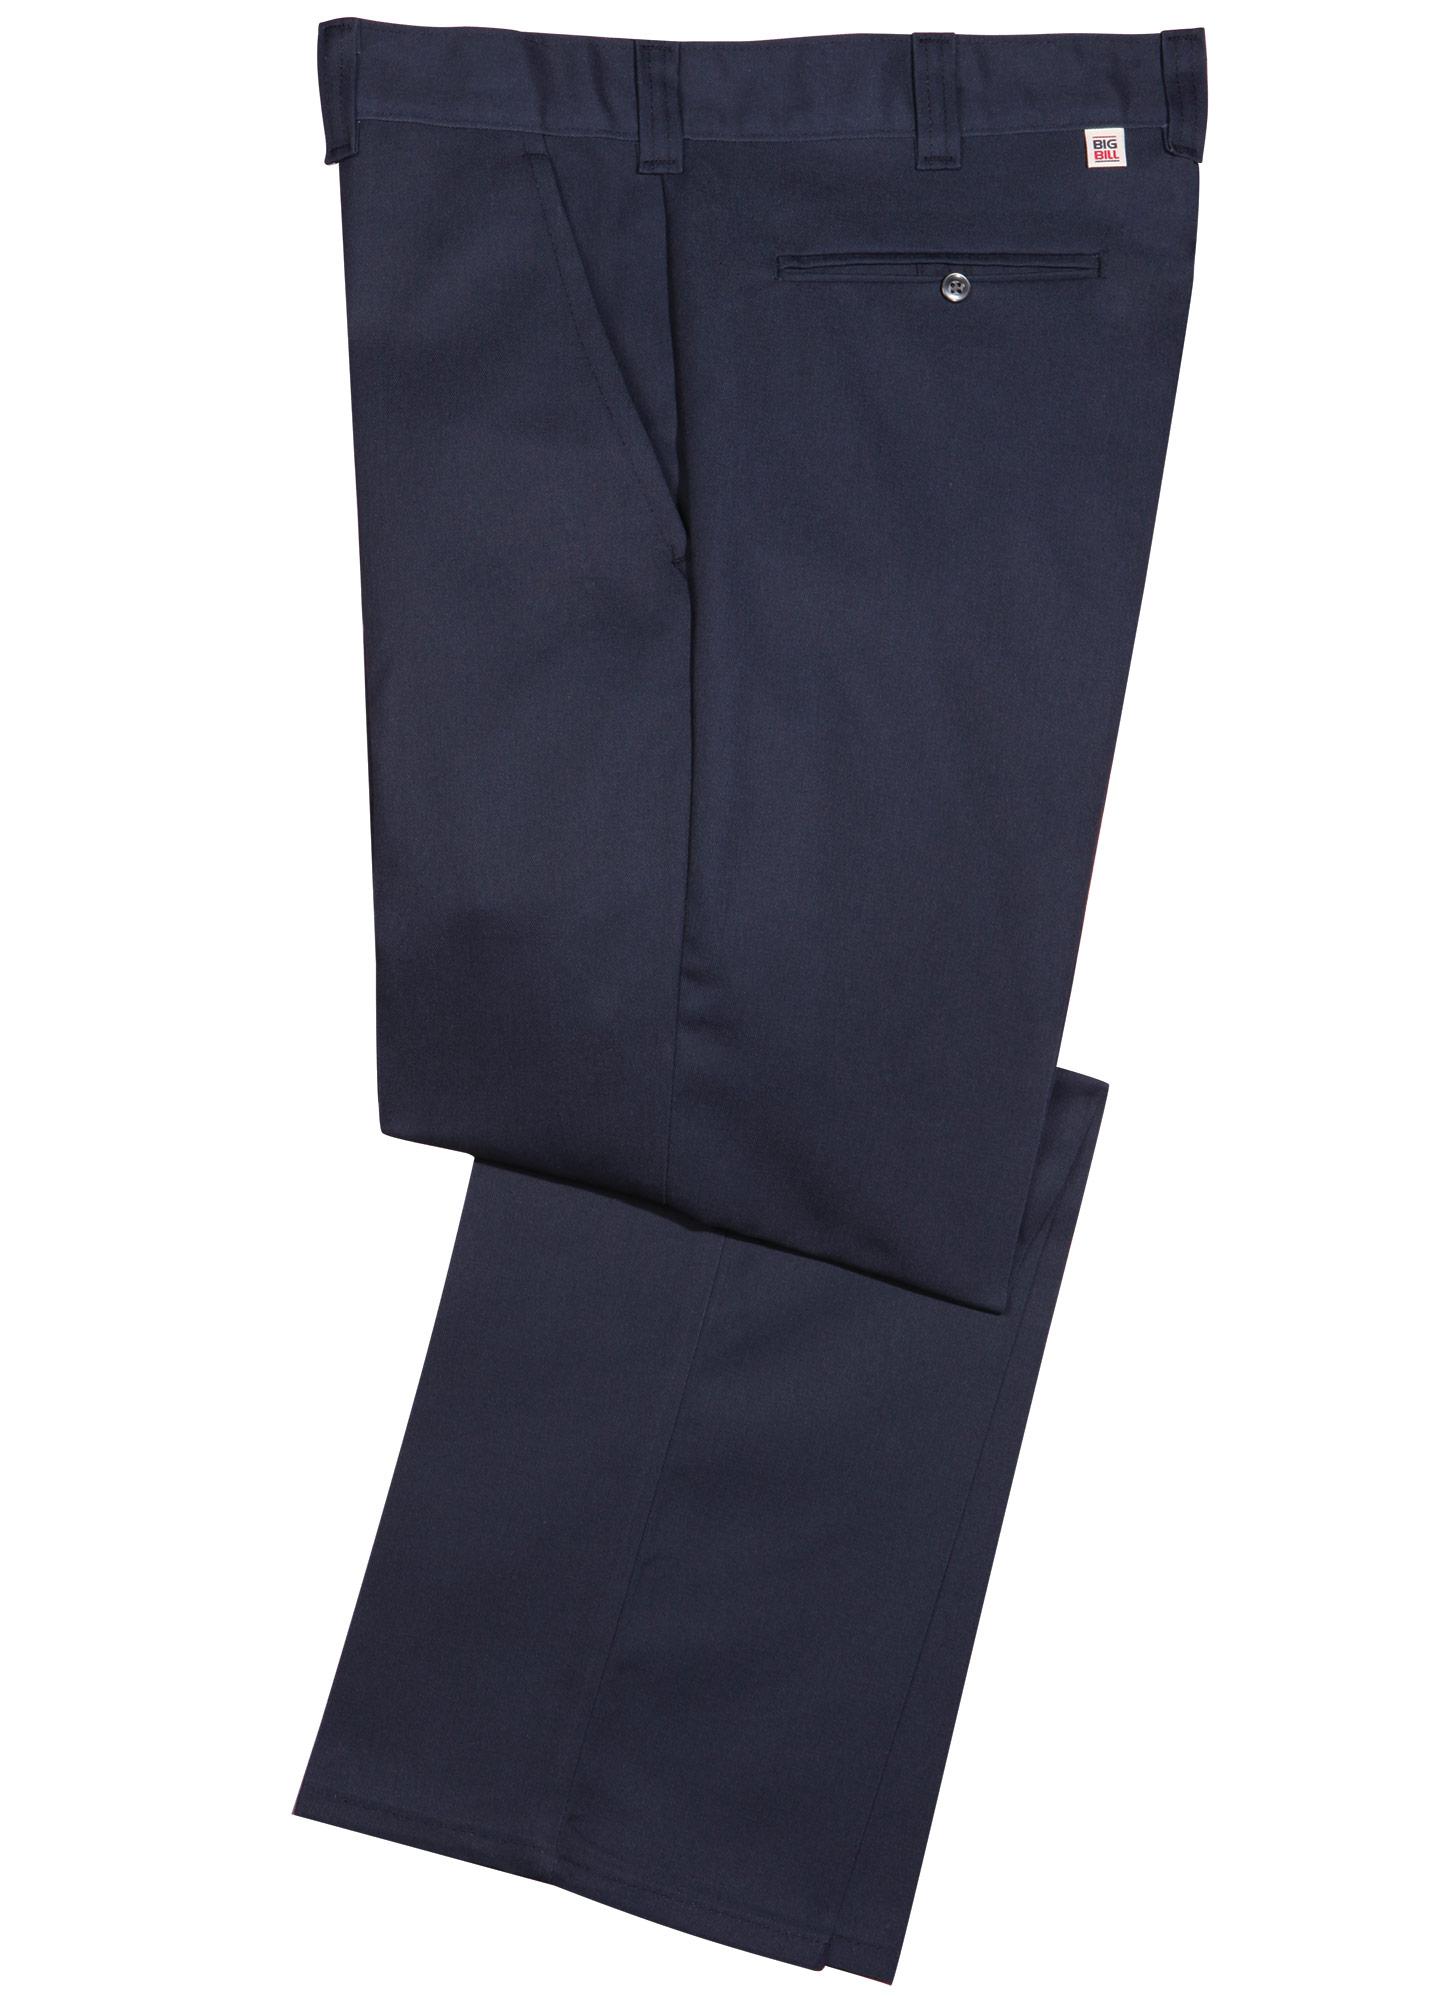 big bill pantalon de travail taille basse 2947. Black Bedroom Furniture Sets. Home Design Ideas